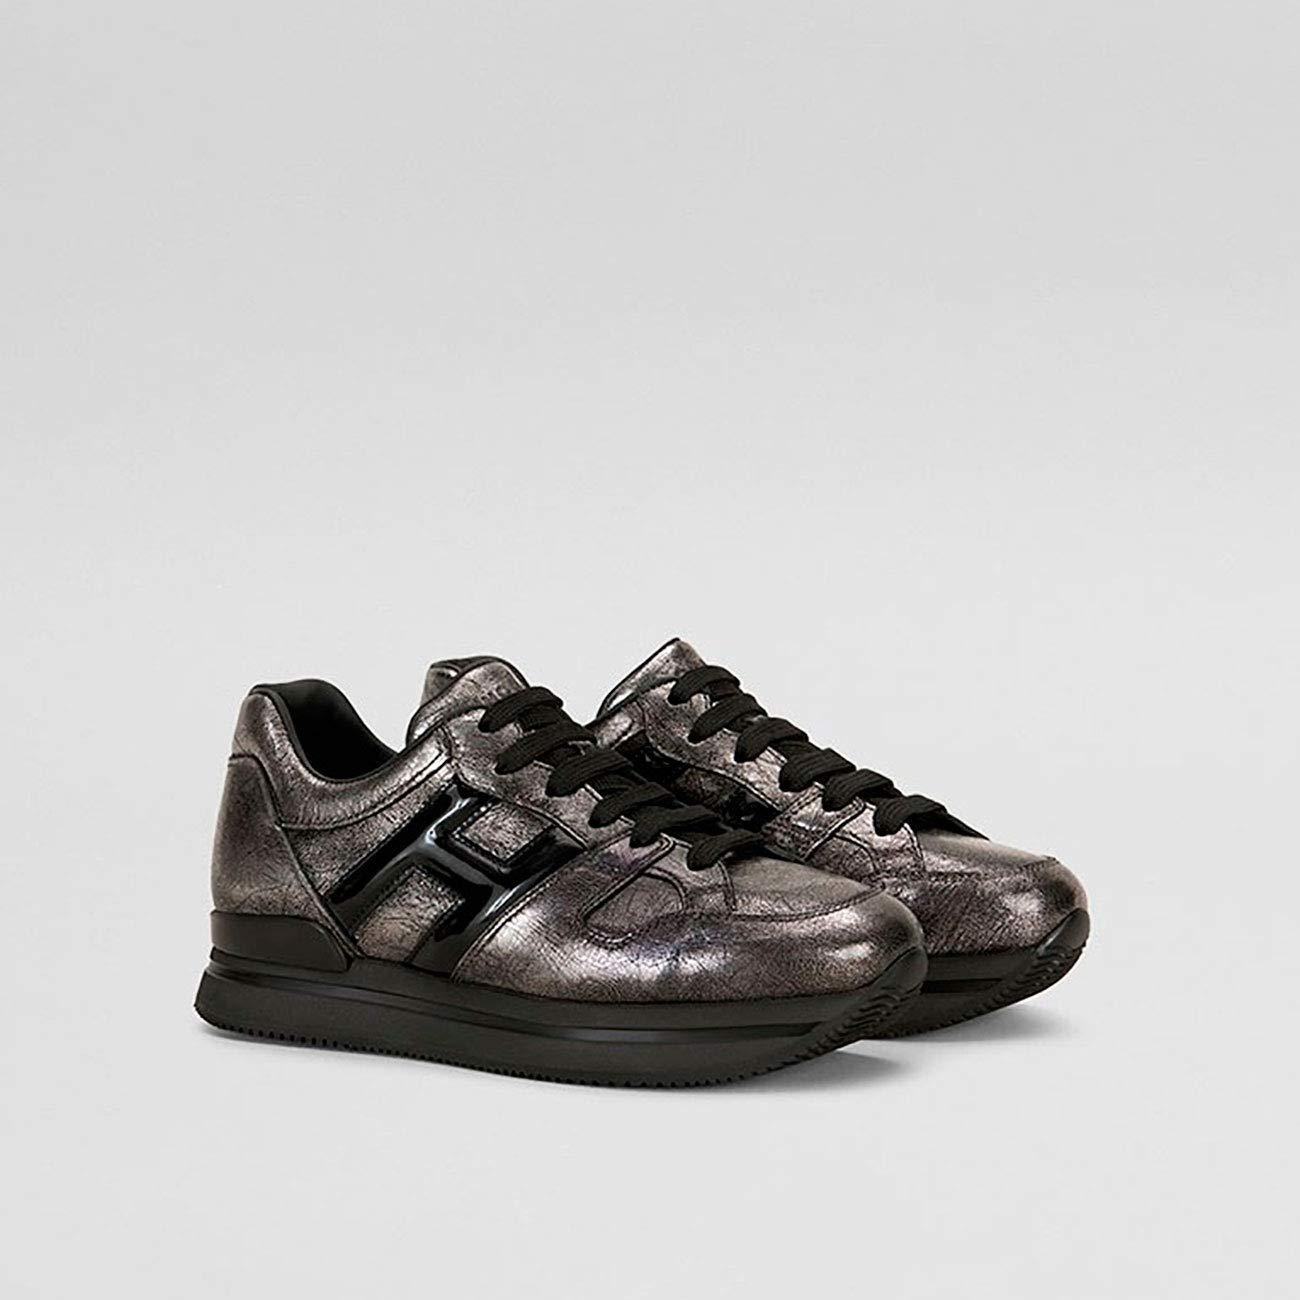 Hogan Turnschuhe H222 IN METALLIC Leather schwarz schwarz schwarz grau, Damen. 9bee1f